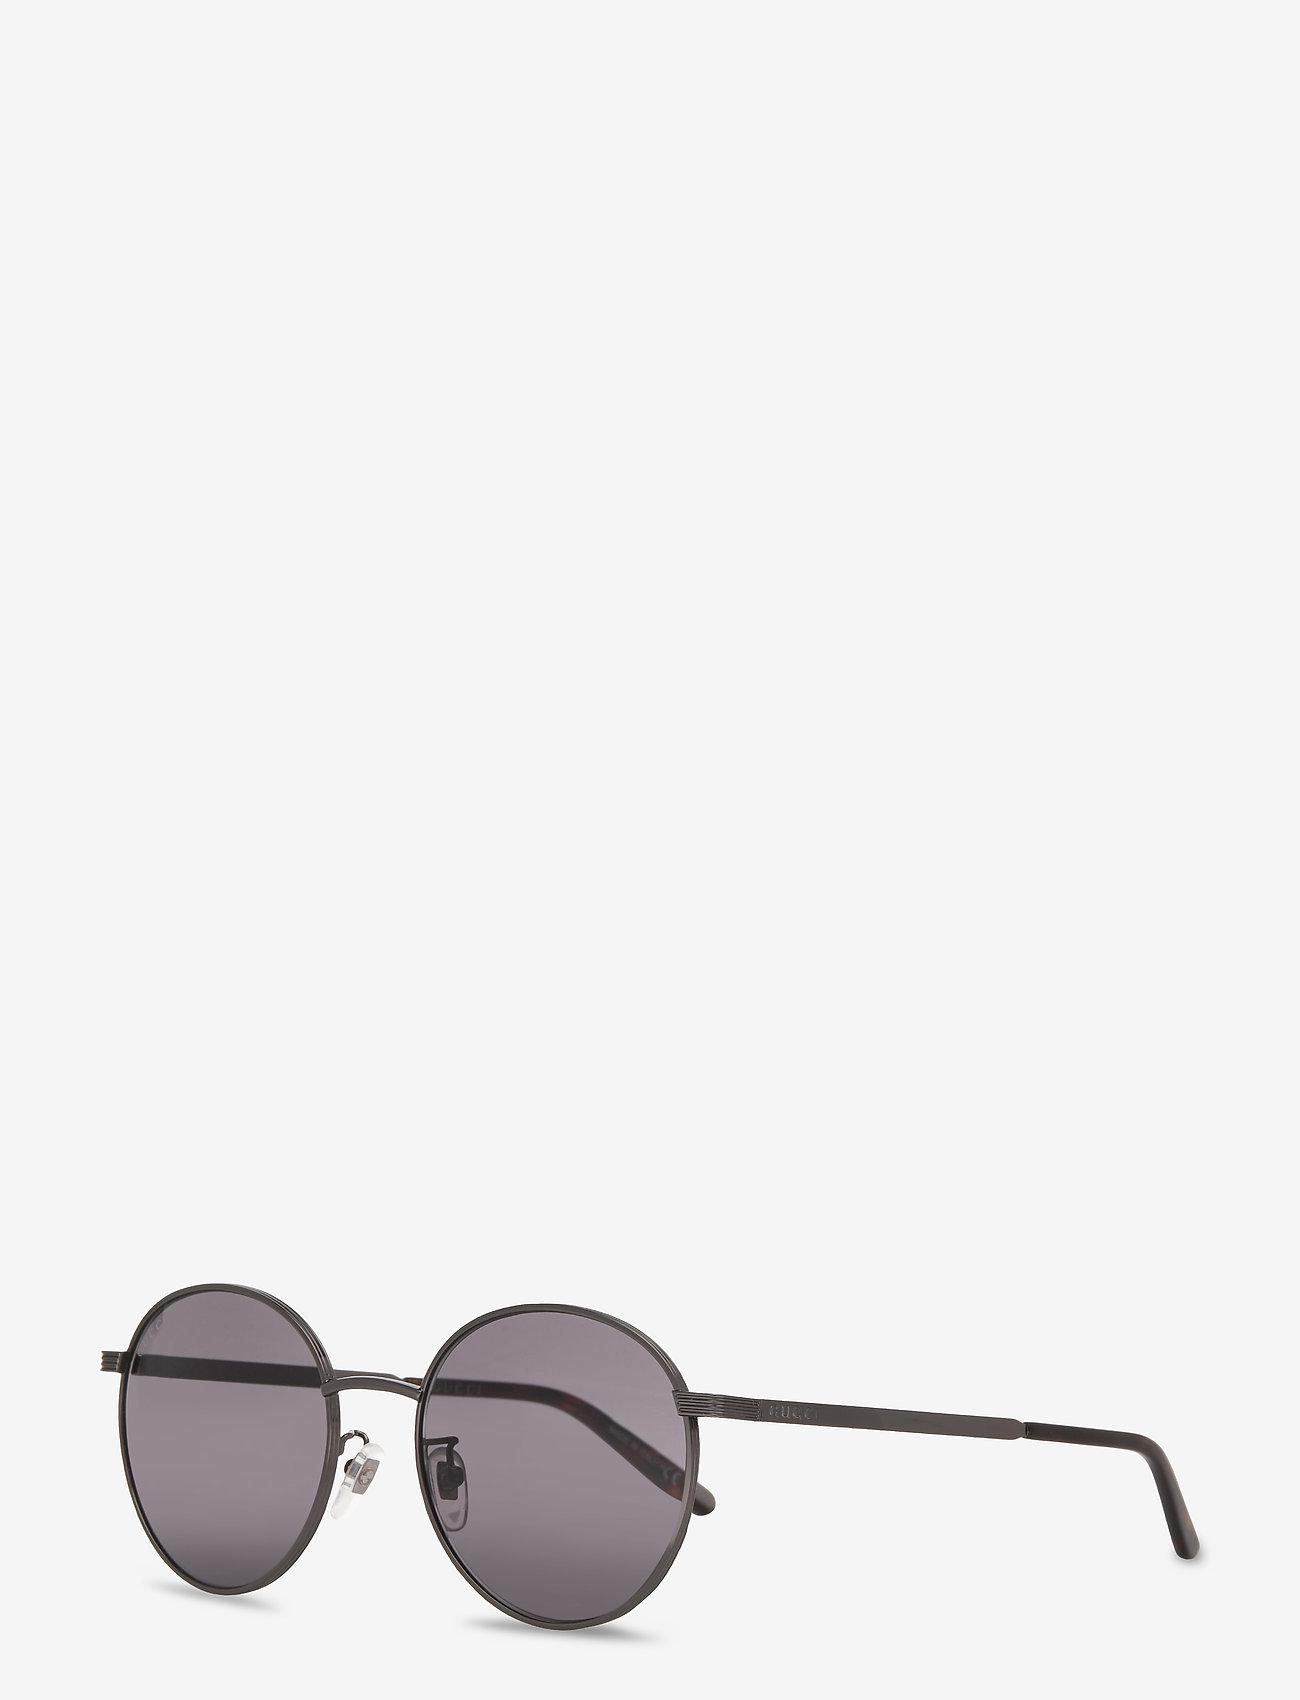 Gucci Sunglasses - GG0944SA - ronde zonnebril - ruthenium-ruthenium-grey - 1